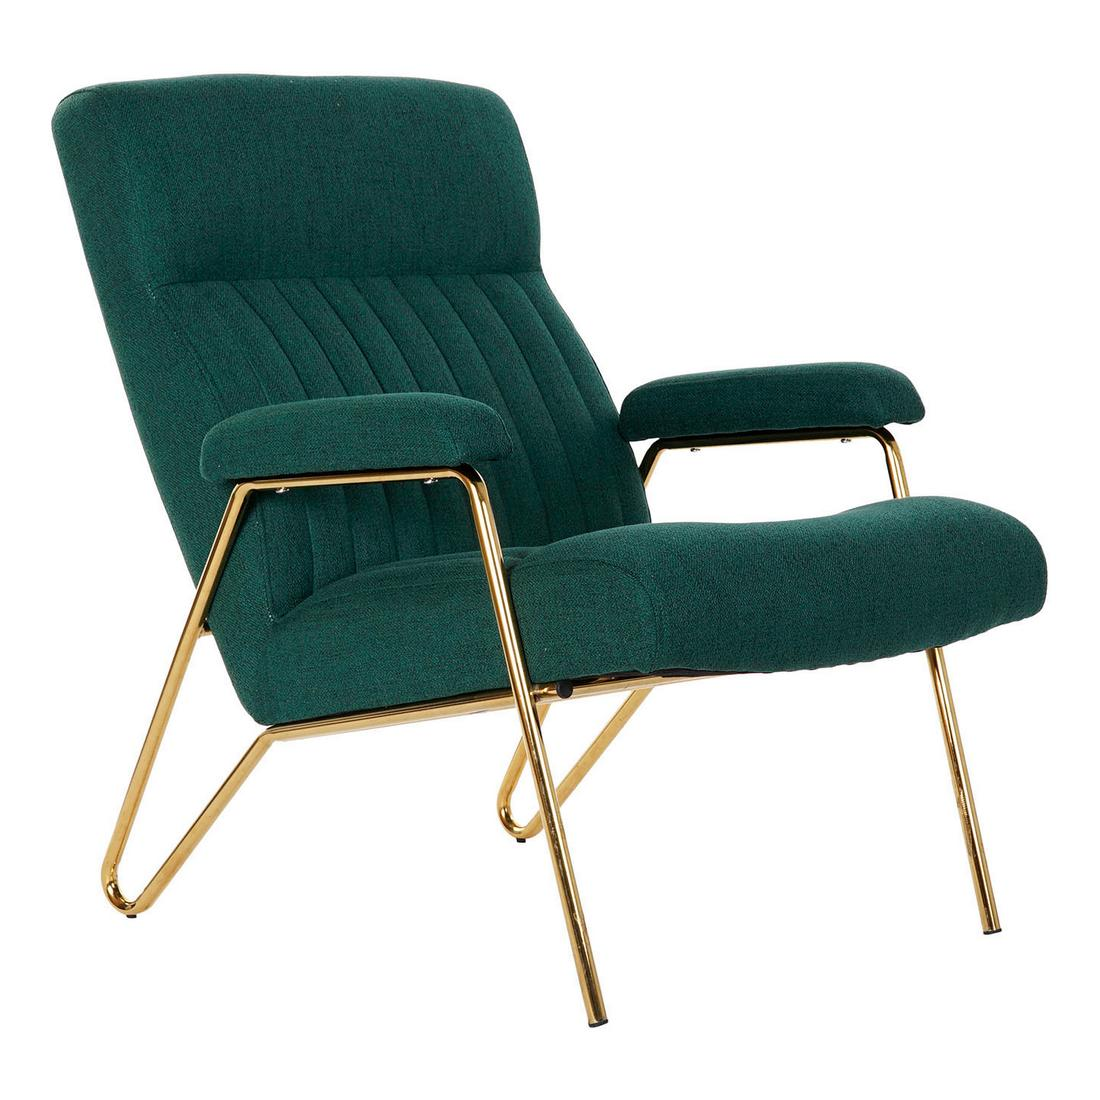 Armchair DKD Home Decor Green Polyester Metal (69 x 90 x 90 cm)